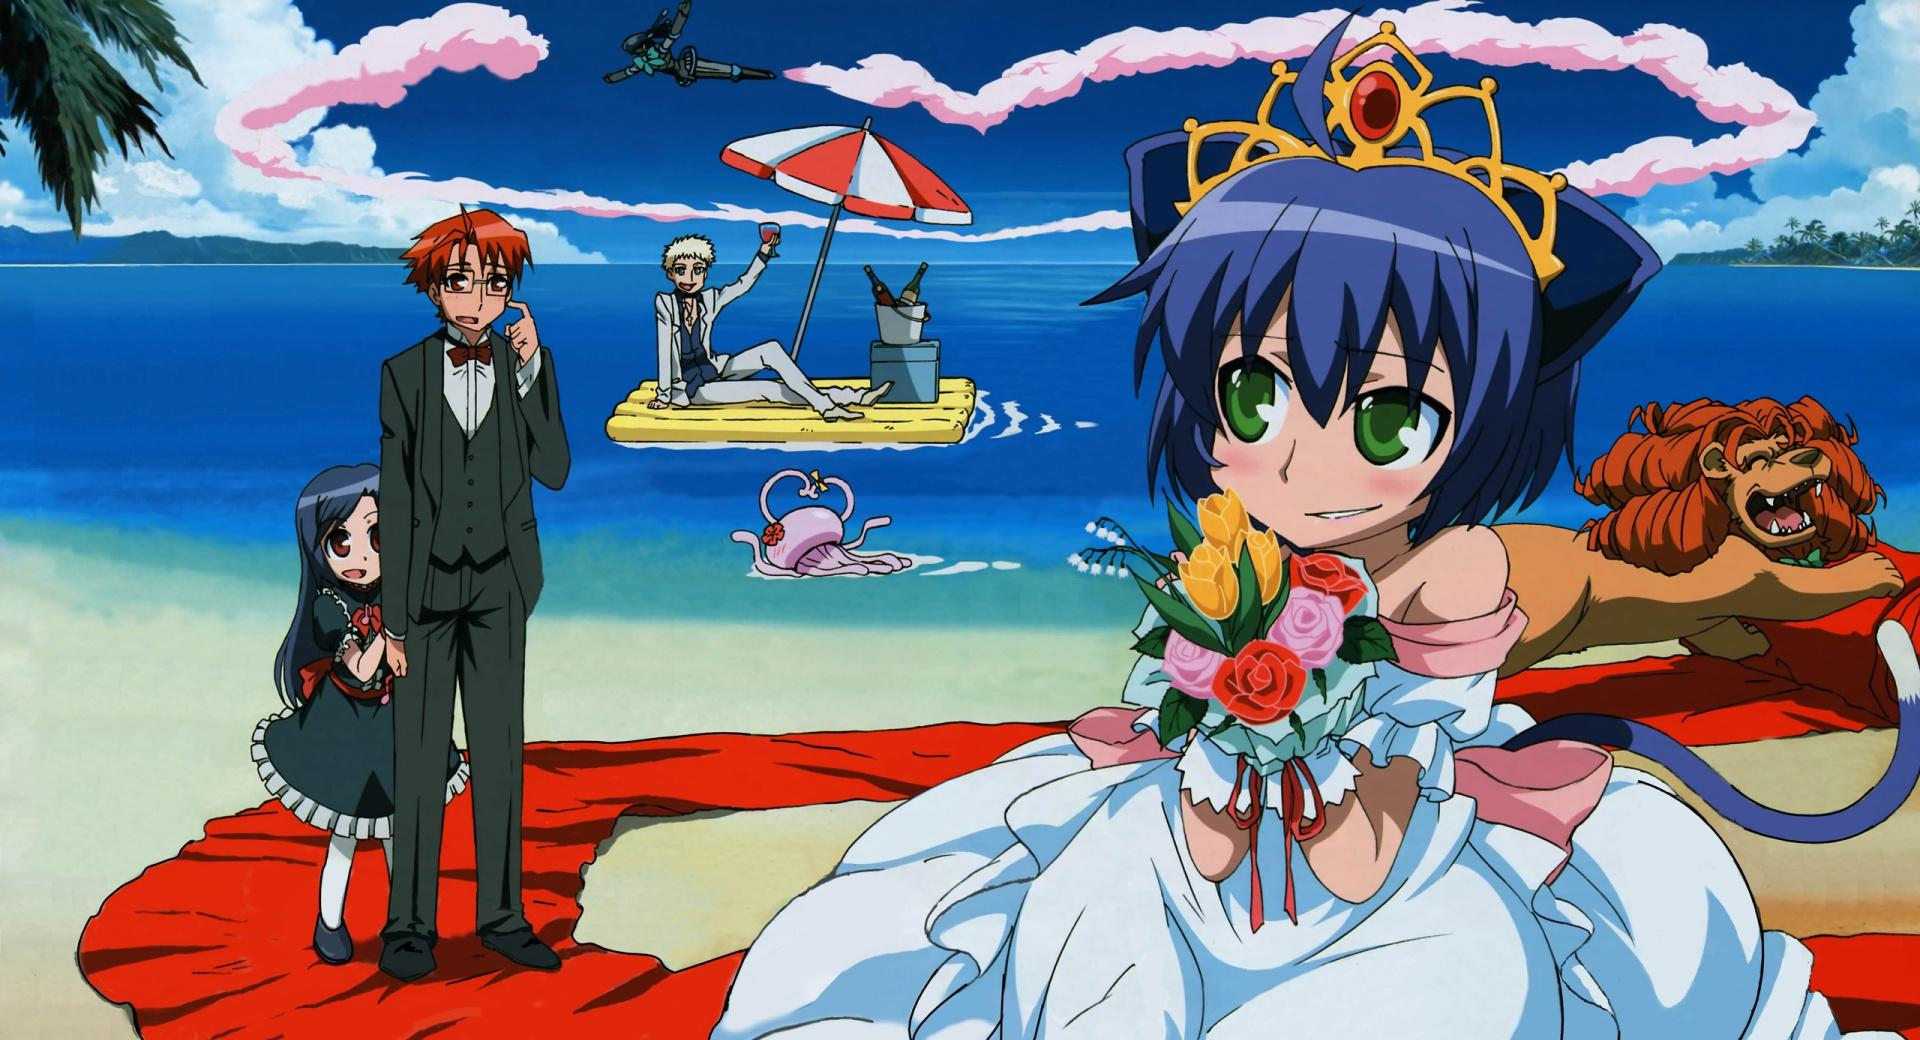 Anime Wedding wallpapers HD quality